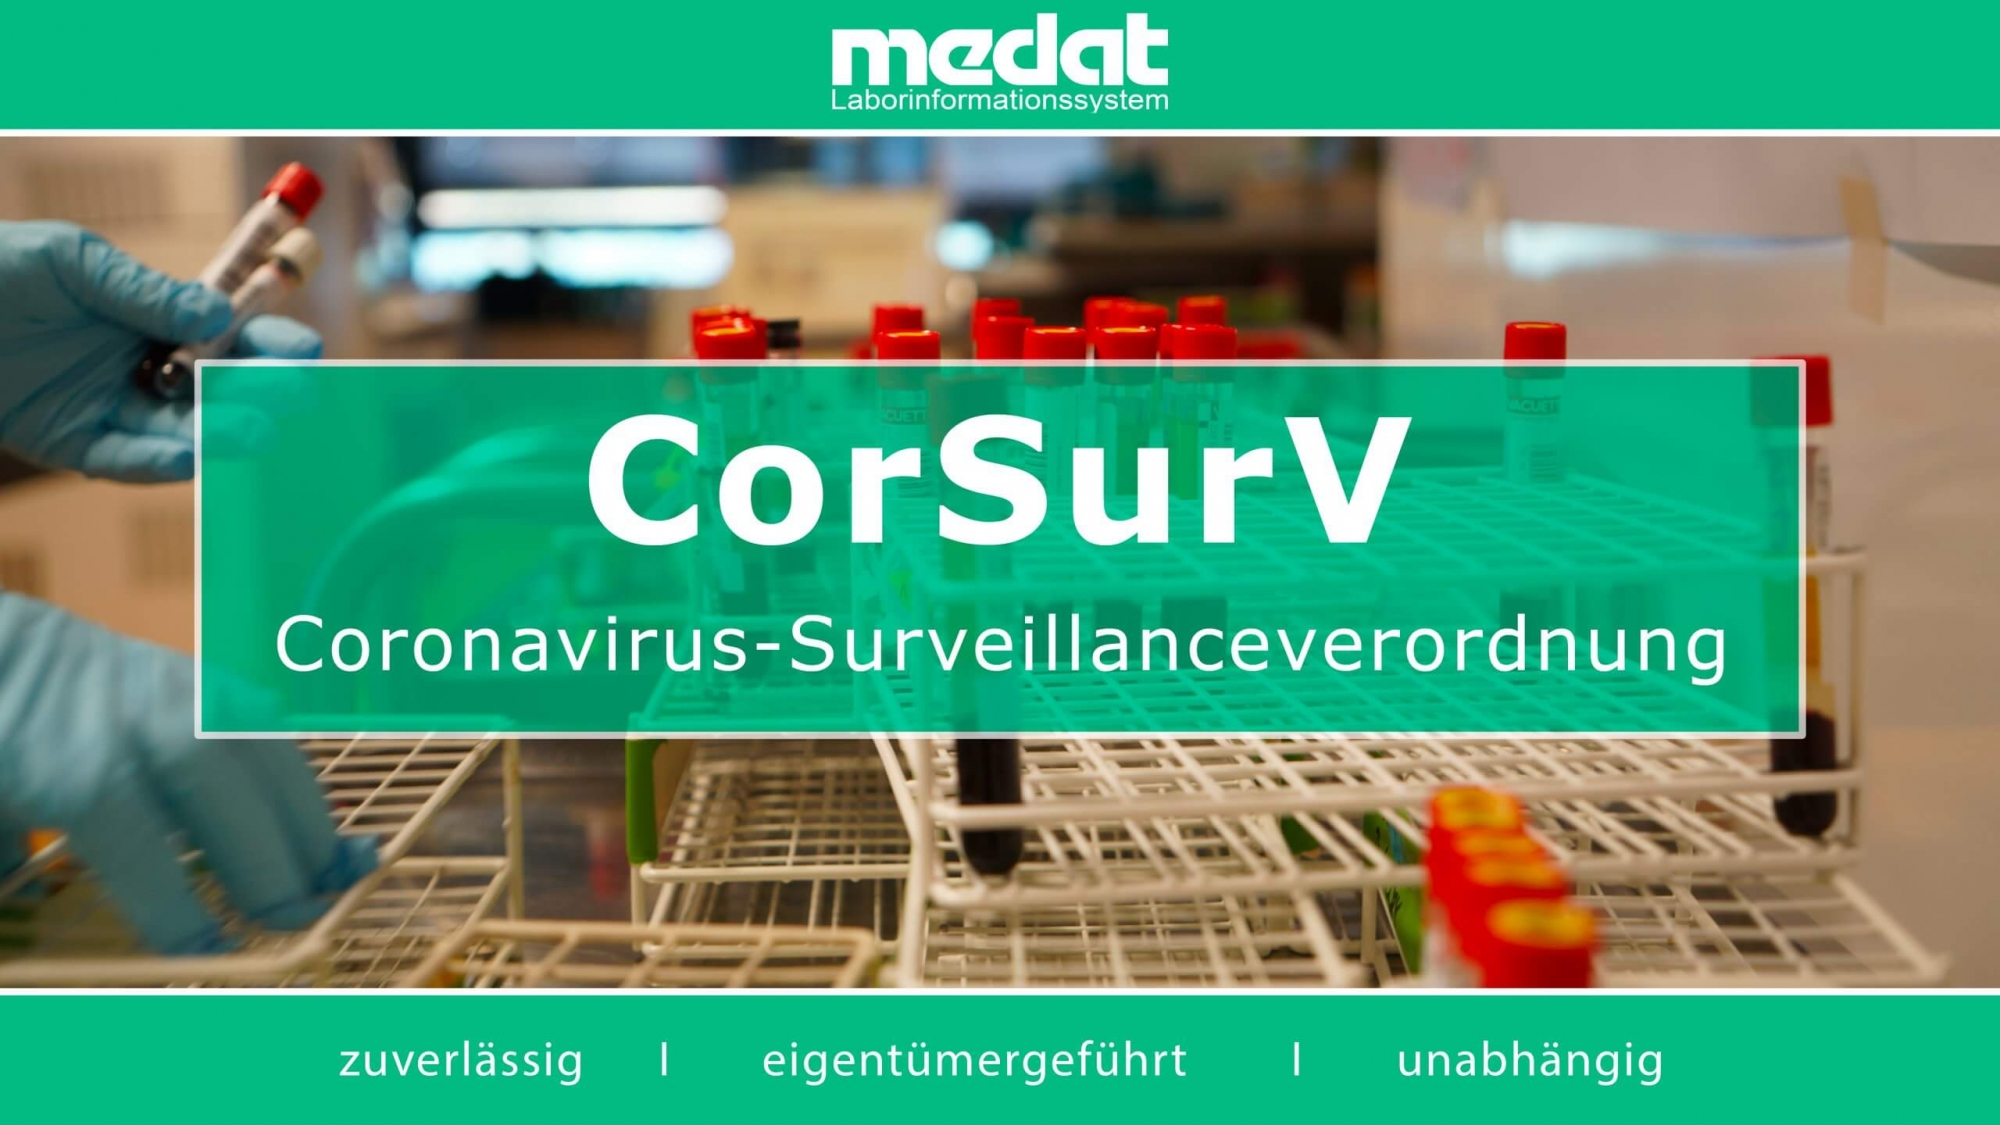 Neue Coronavirus-Surveillanceverordnung